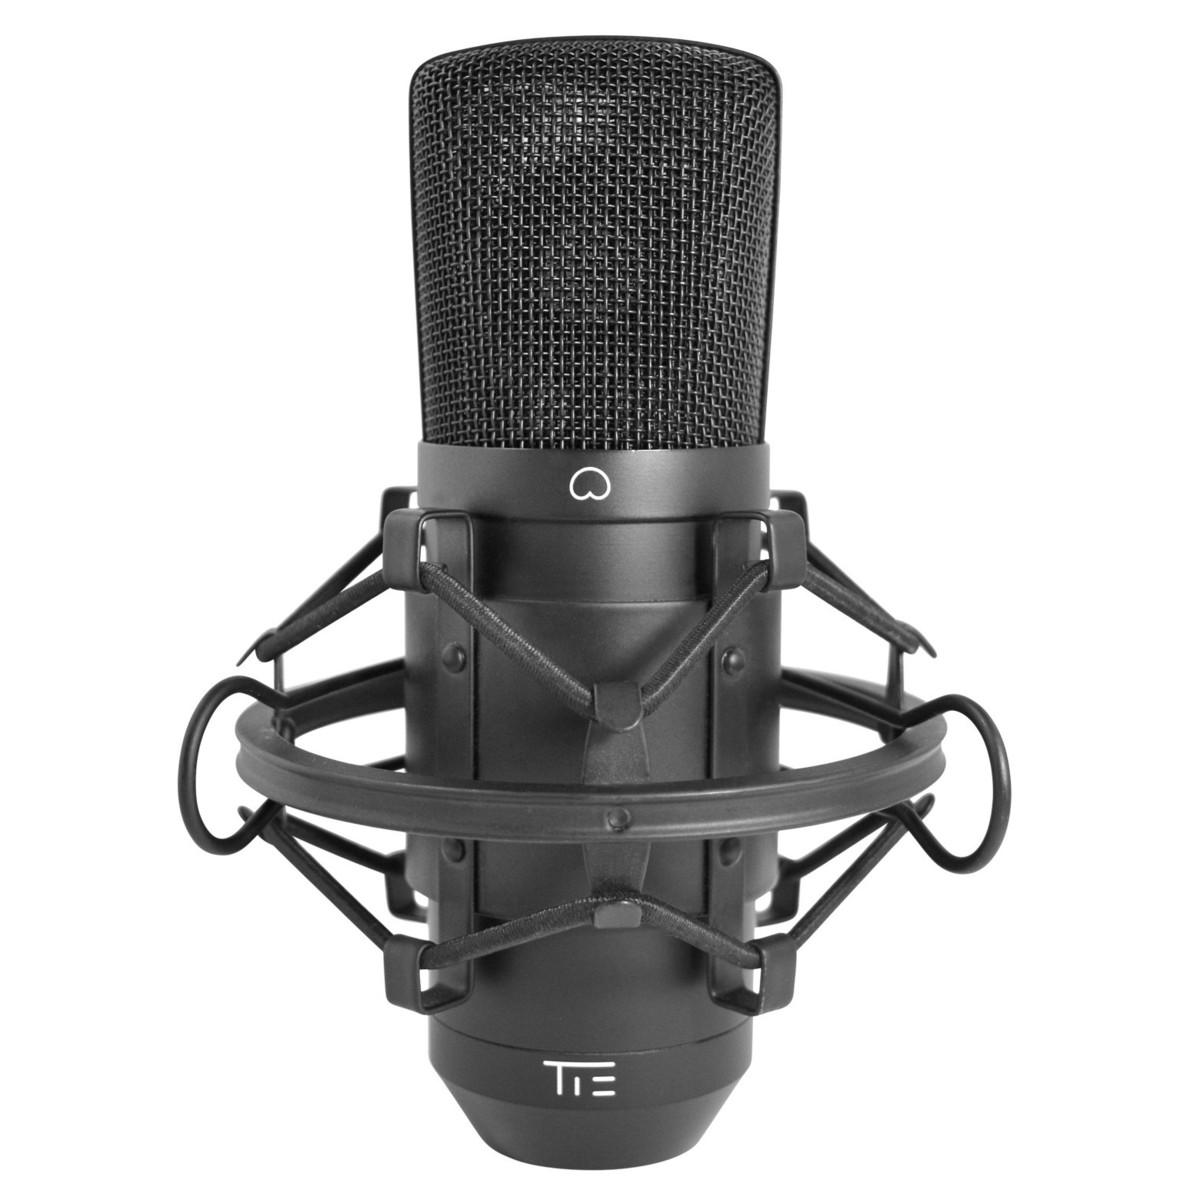 tie studio usb large diaphragm condenser mic at. Black Bedroom Furniture Sets. Home Design Ideas